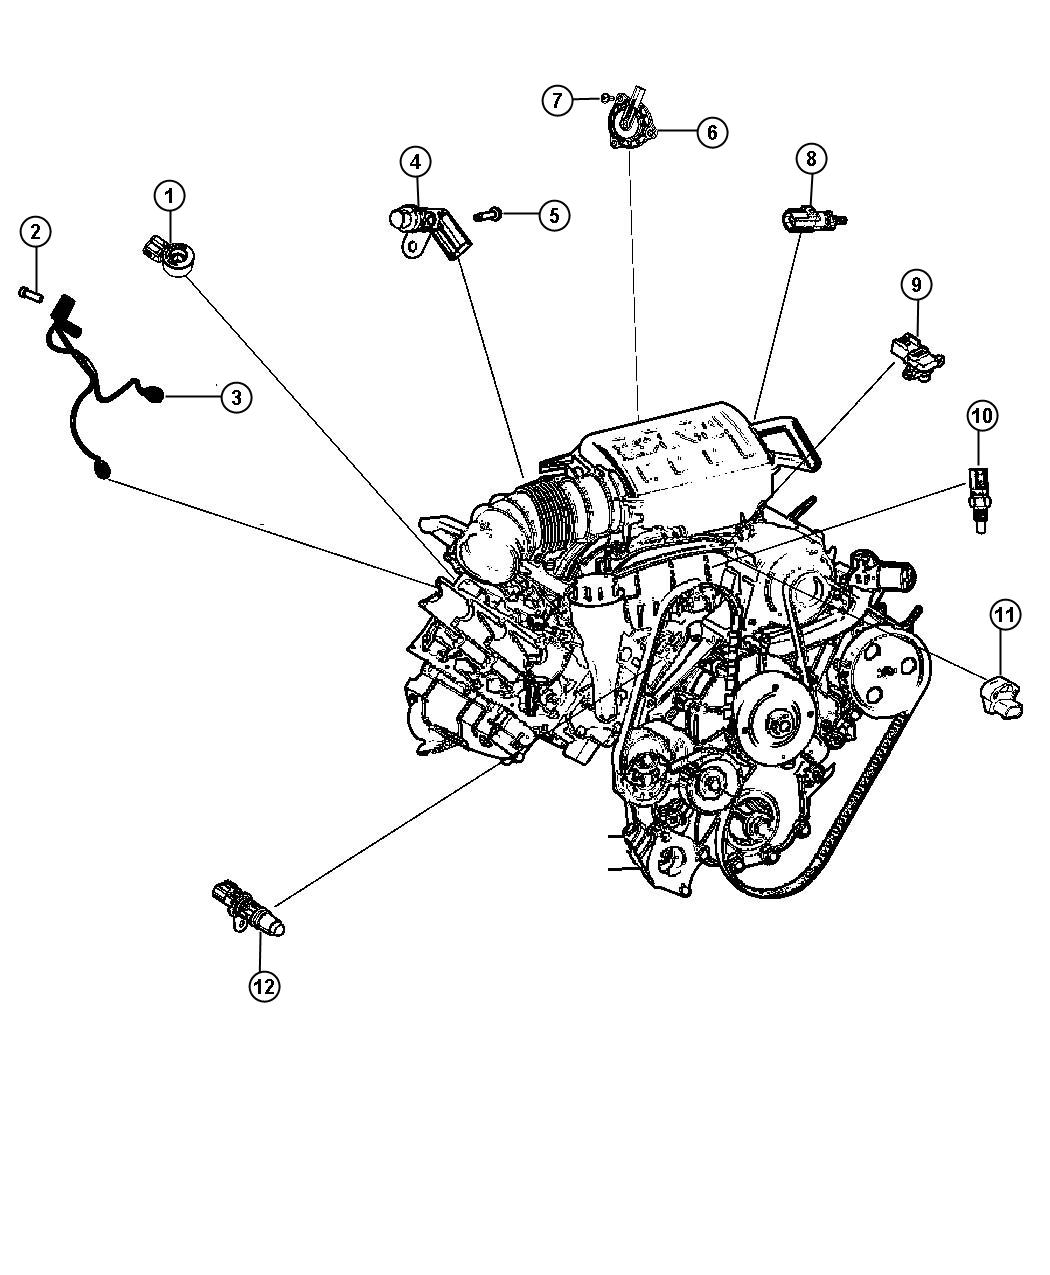 Dodge Durango Screw M5x 8x20 Mounting Hbarear Pvc